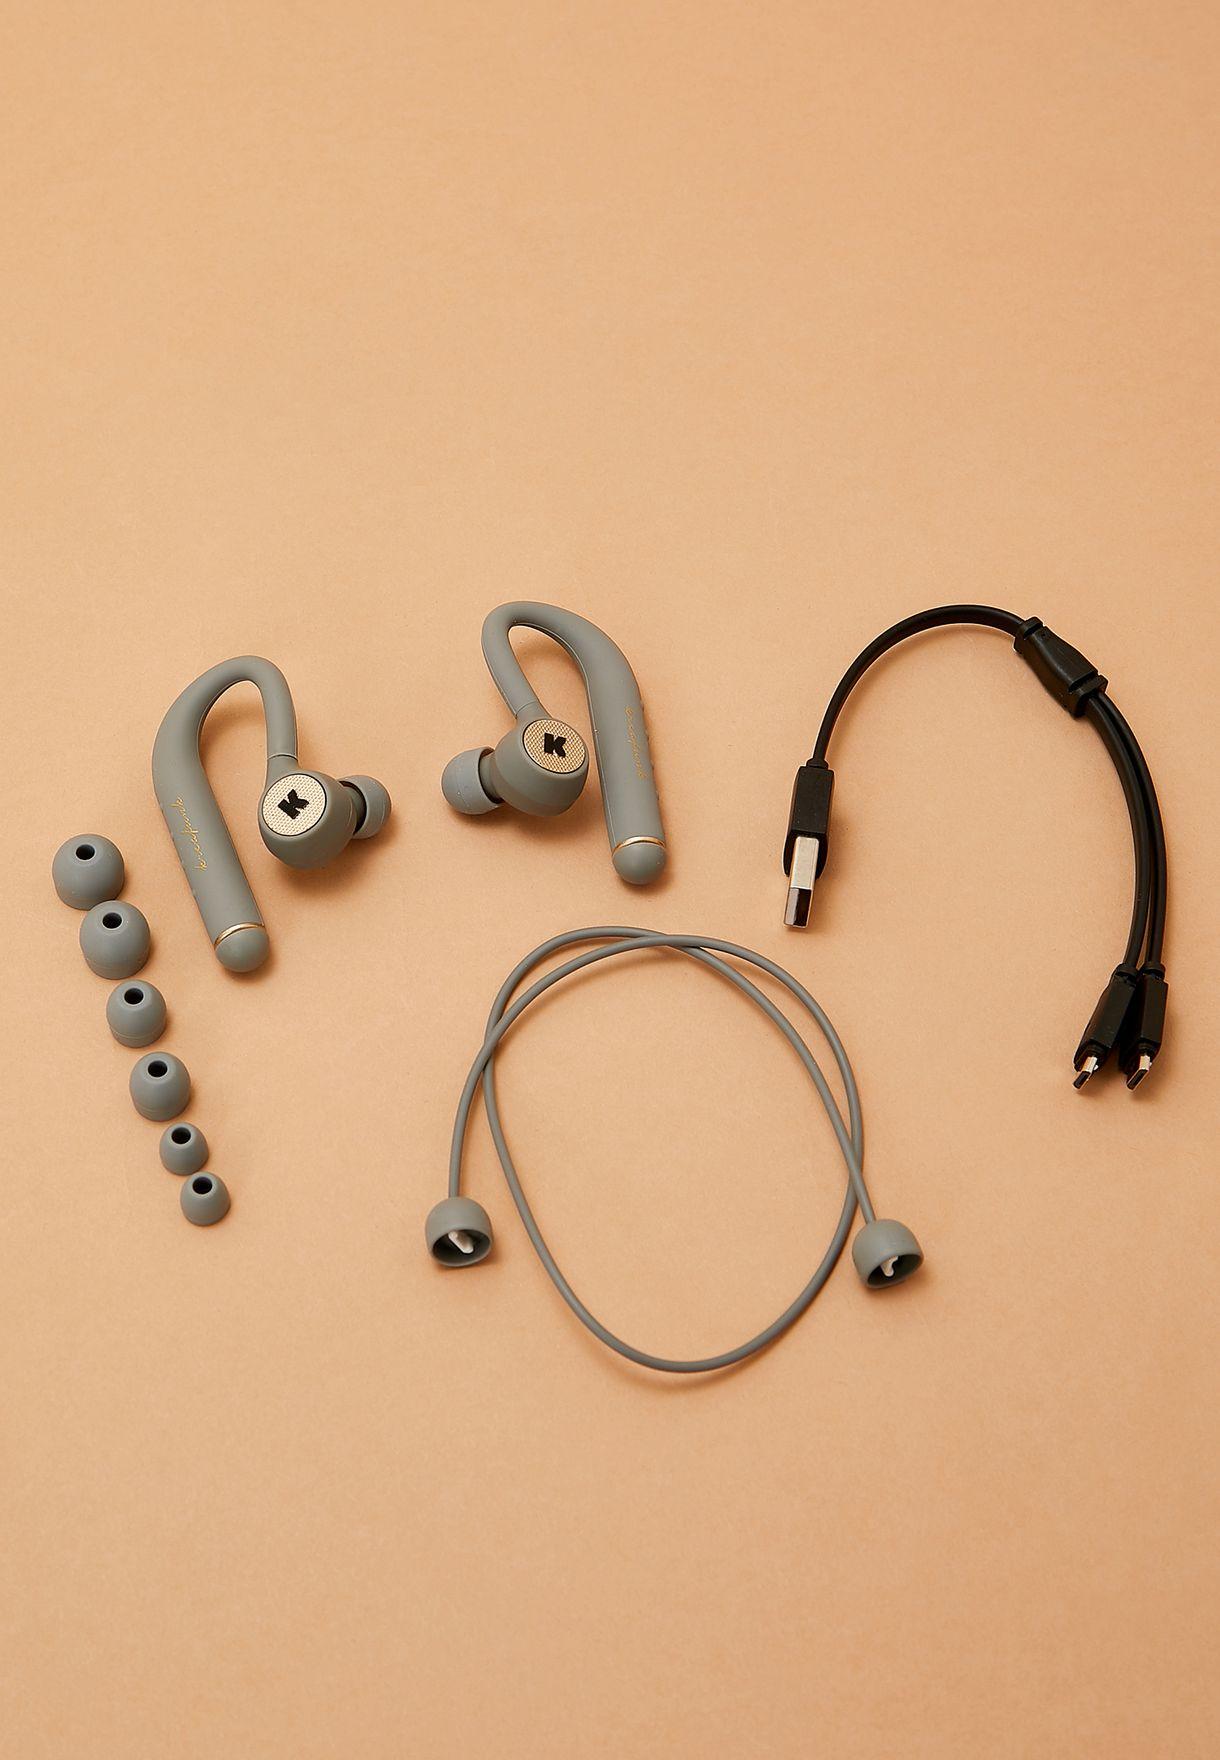 Bgem Bluetooth Headphones